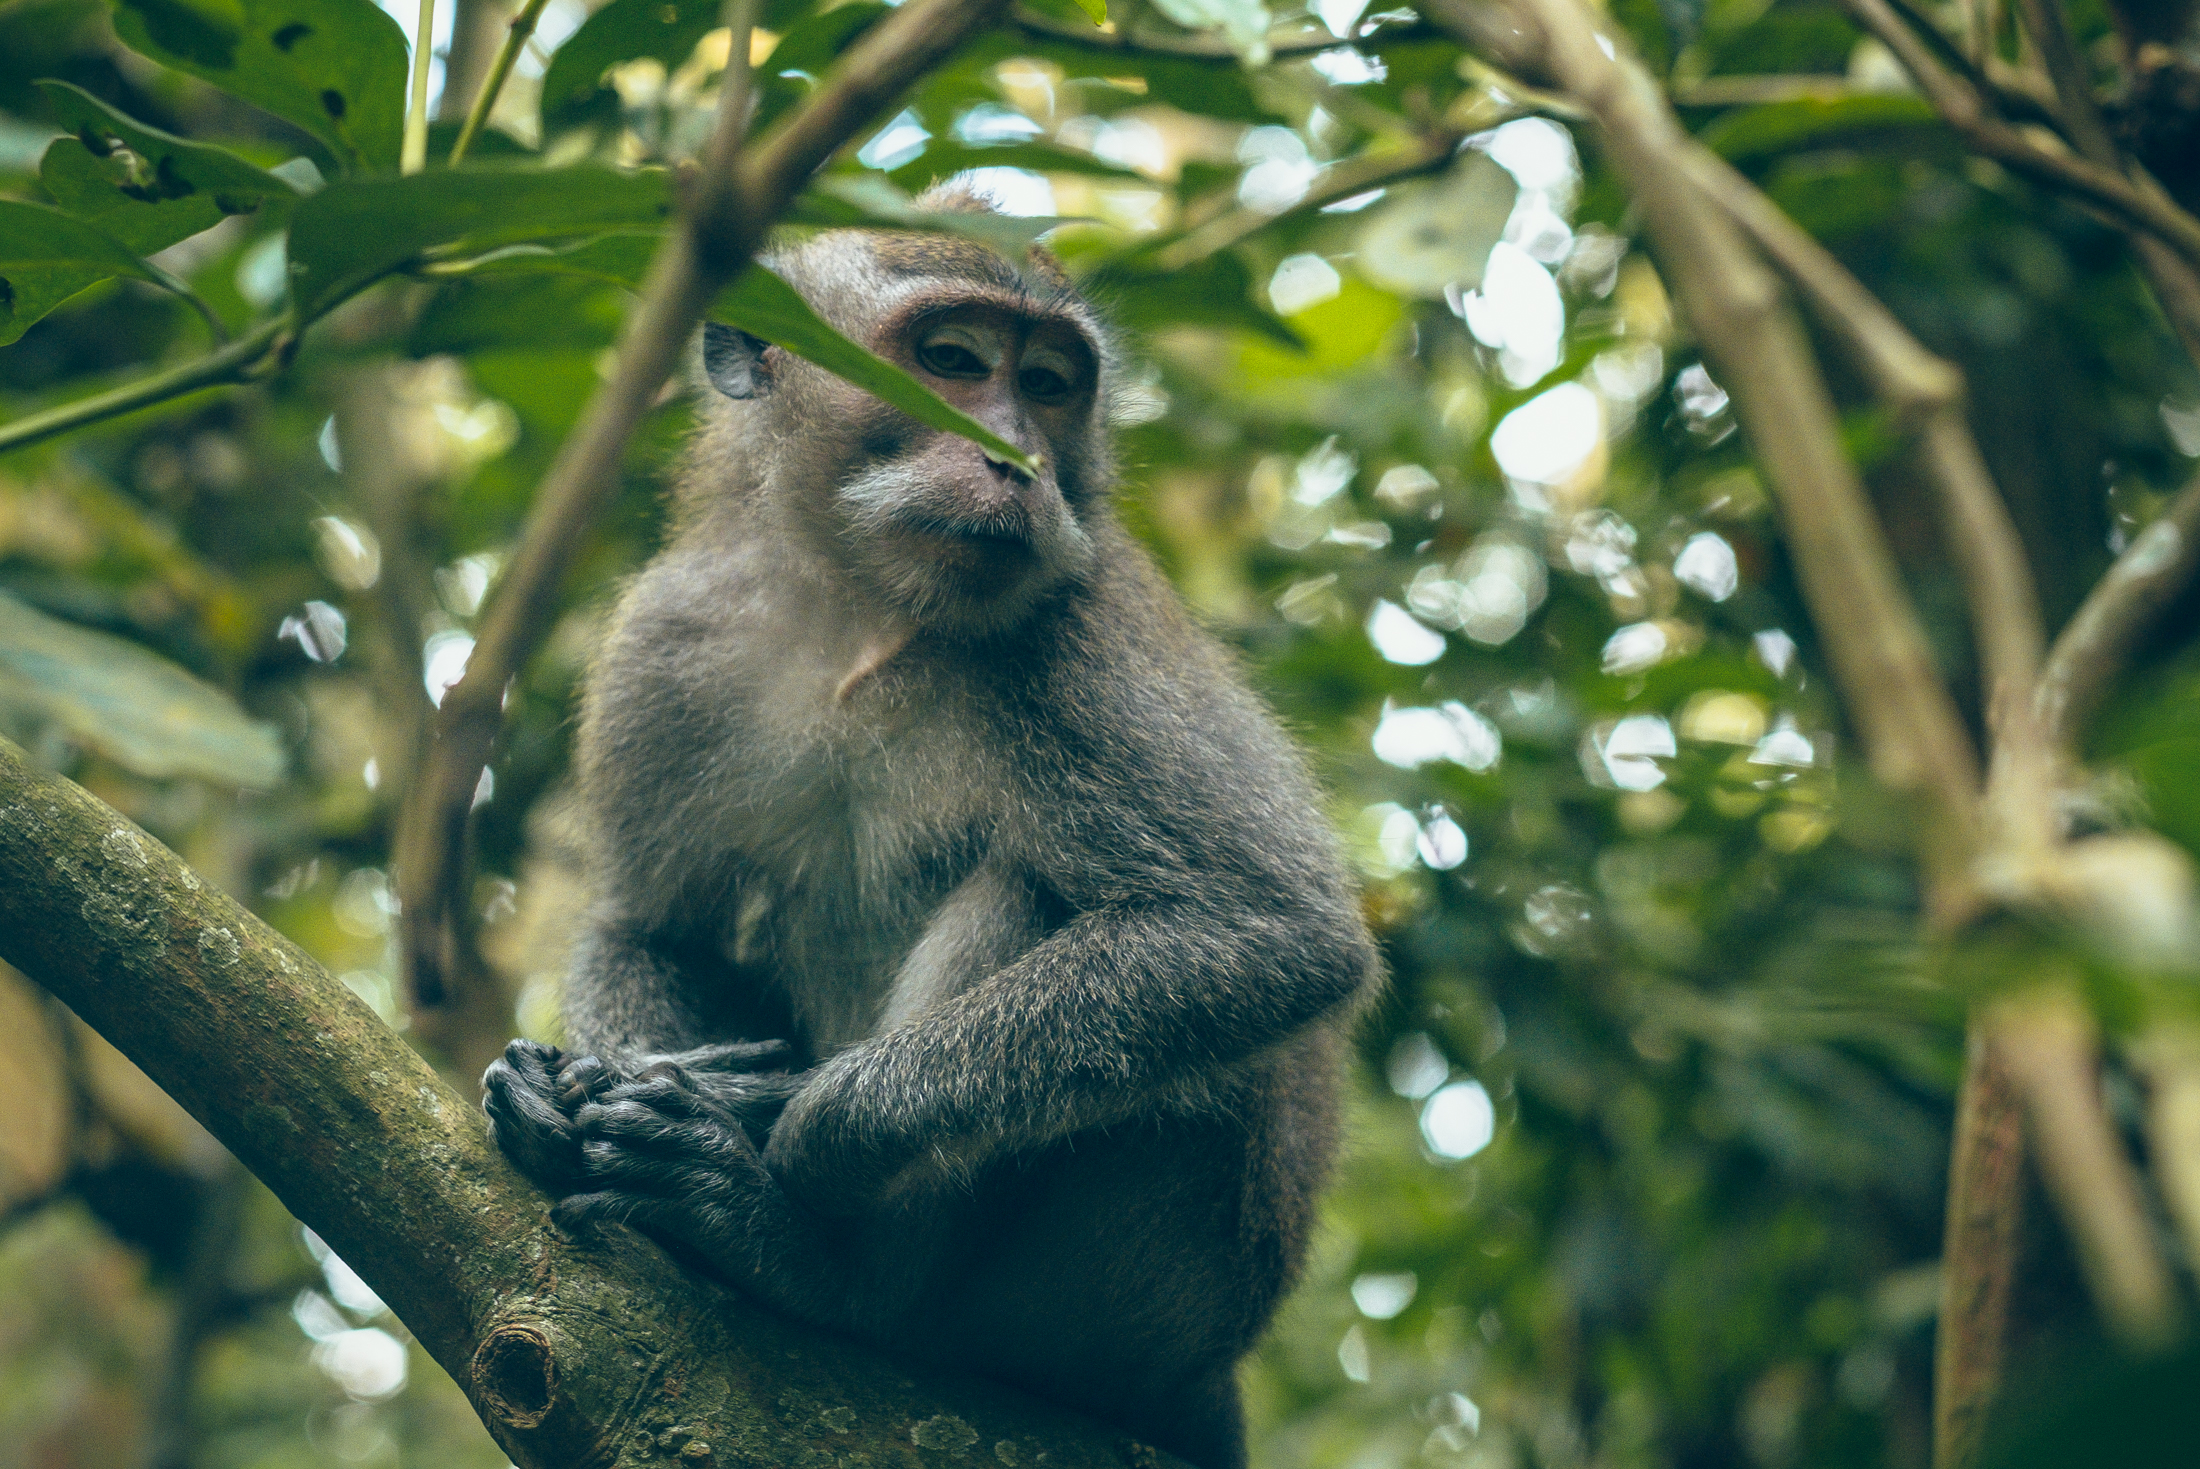 bali_day9_monkey-21.jpg